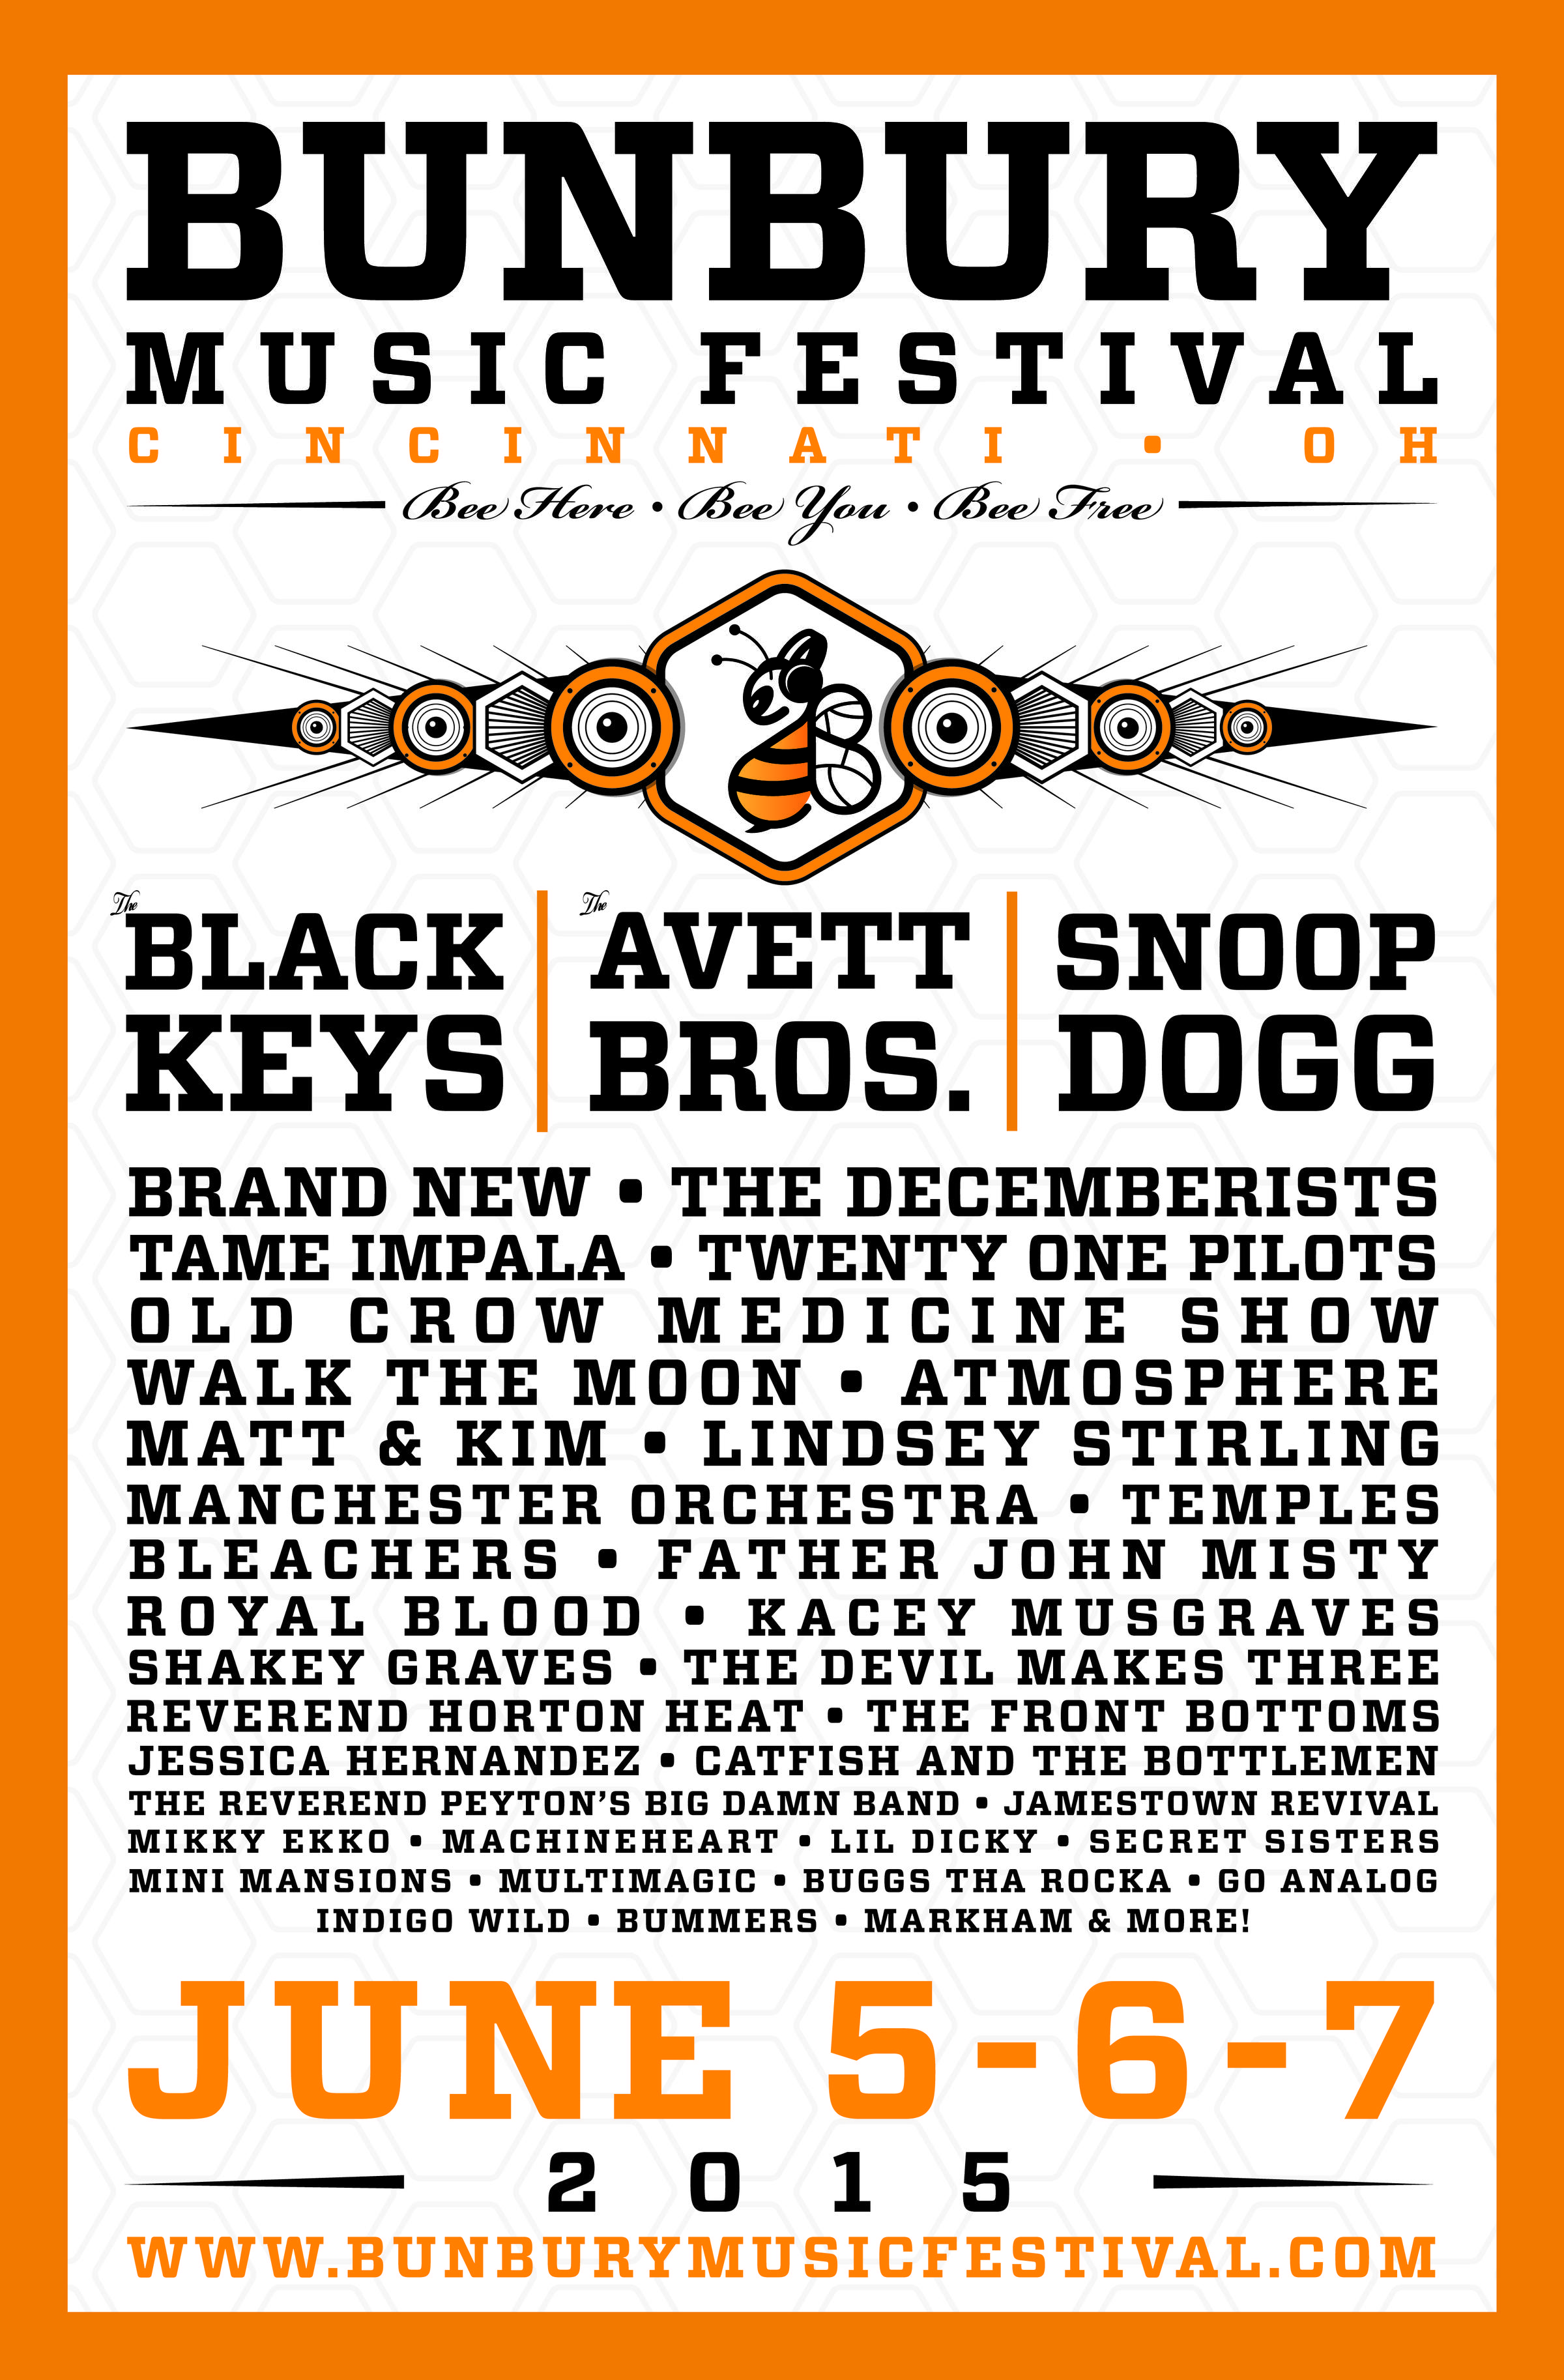 Bunbury Music Festival Announces 2015 Artist Lineup The